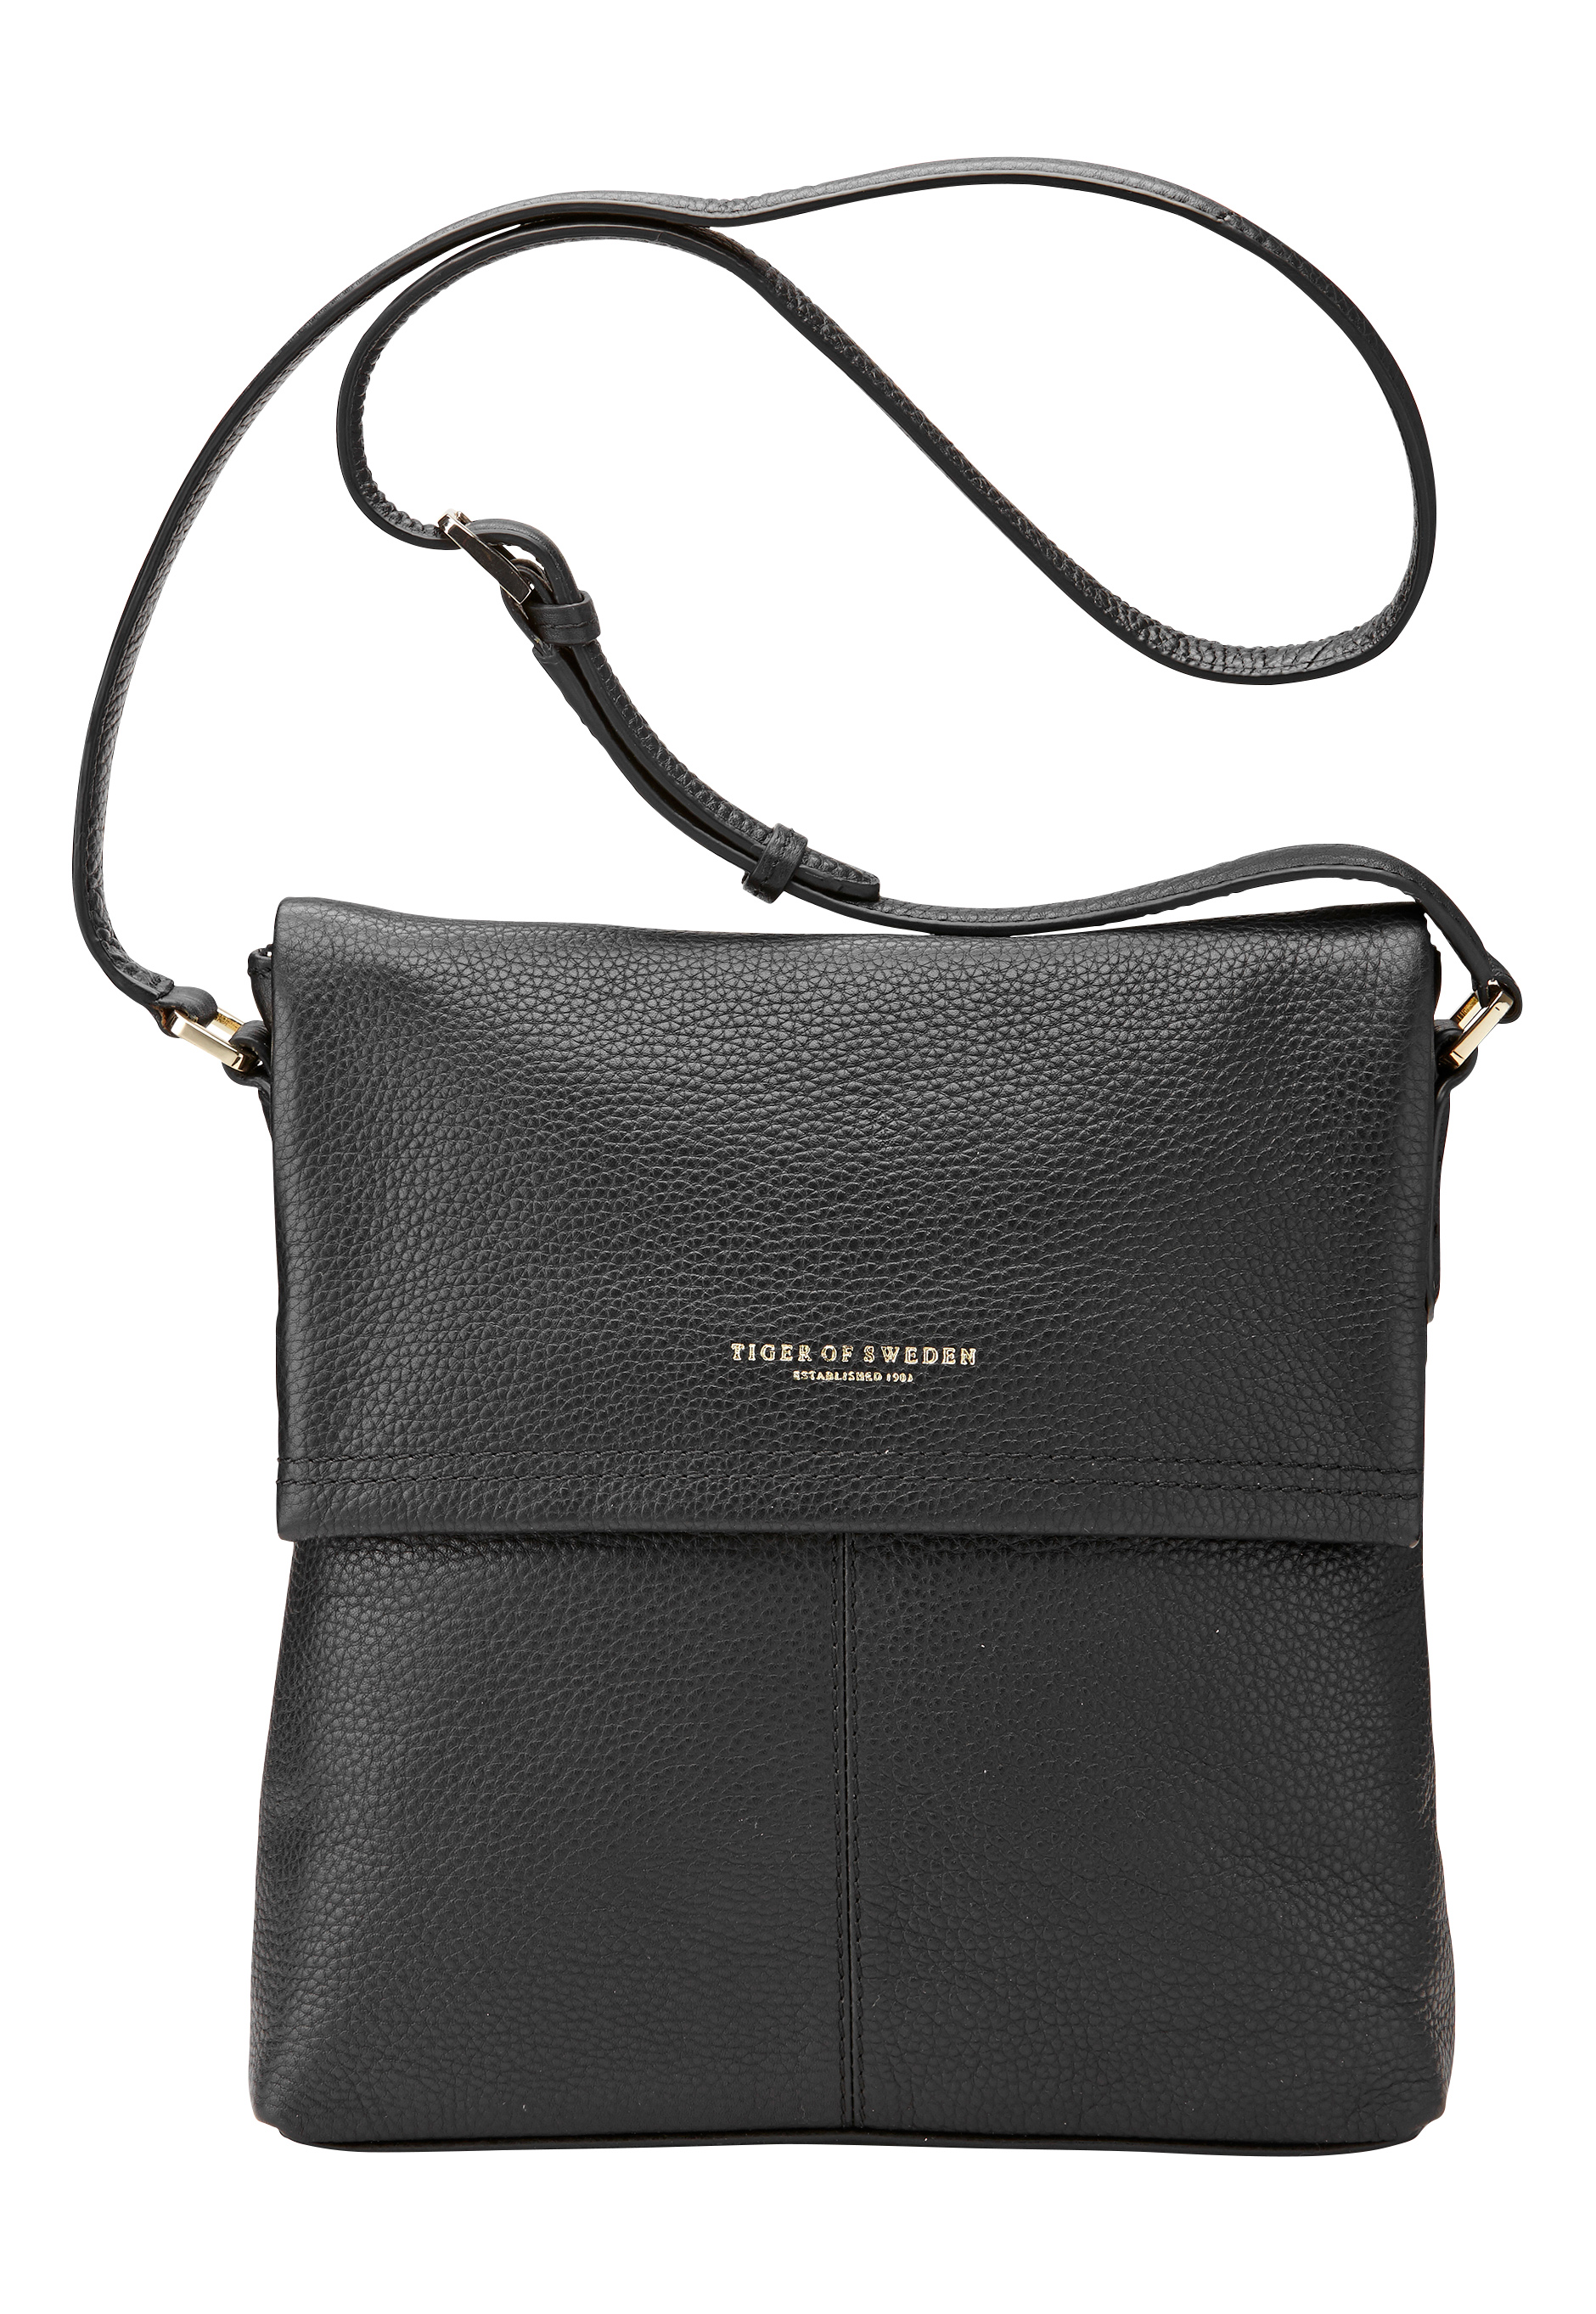 TIGER OF SWEDEN Calbella Leather Bag 050 Black Bubbleroom